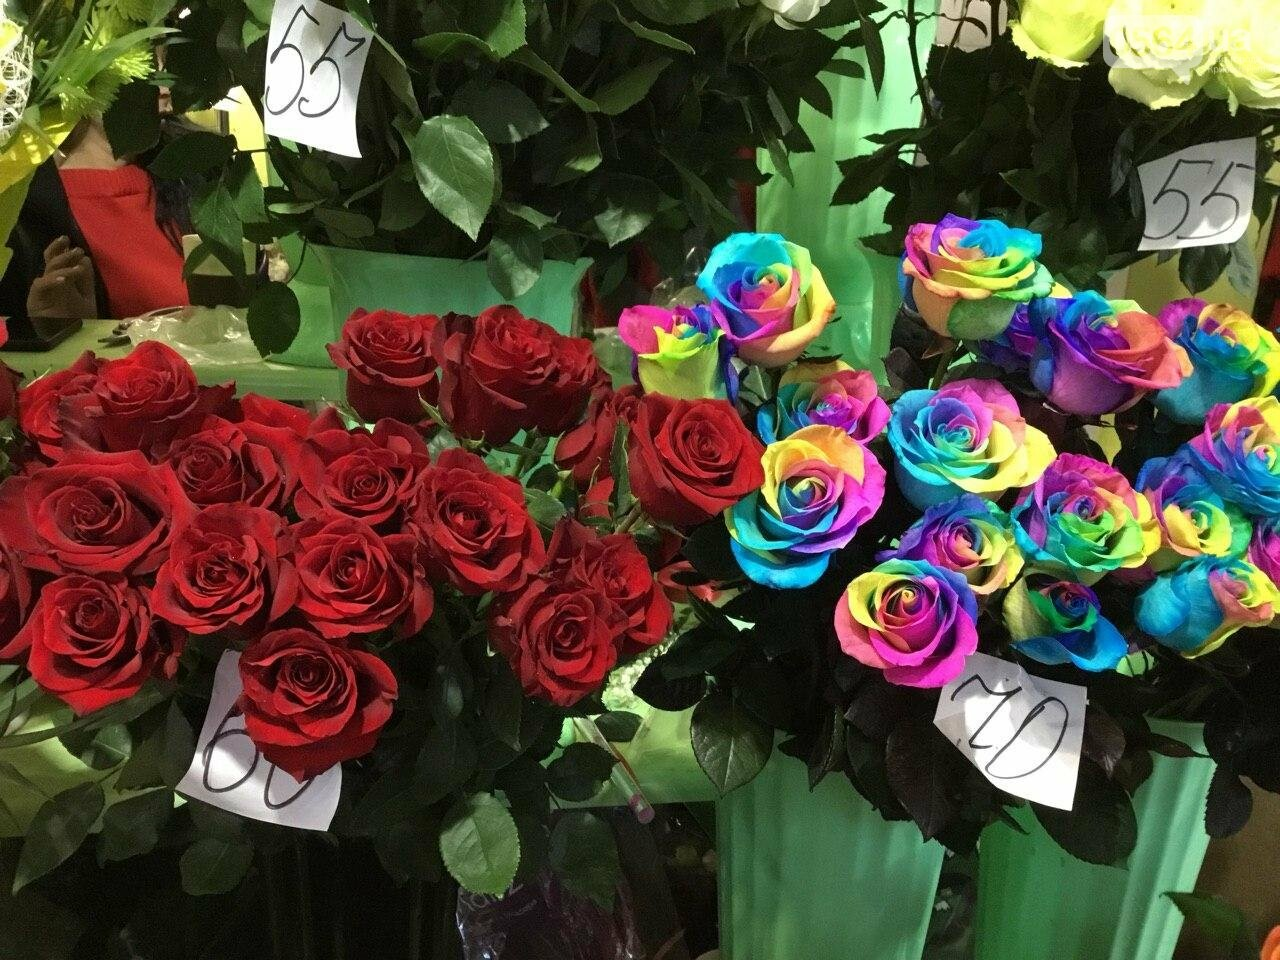 Сколько стоят примула, цикламен, мимоза? Обзор цен на цветы в Кривом Роге, - ФОТО, ВИДЕО, фото-8